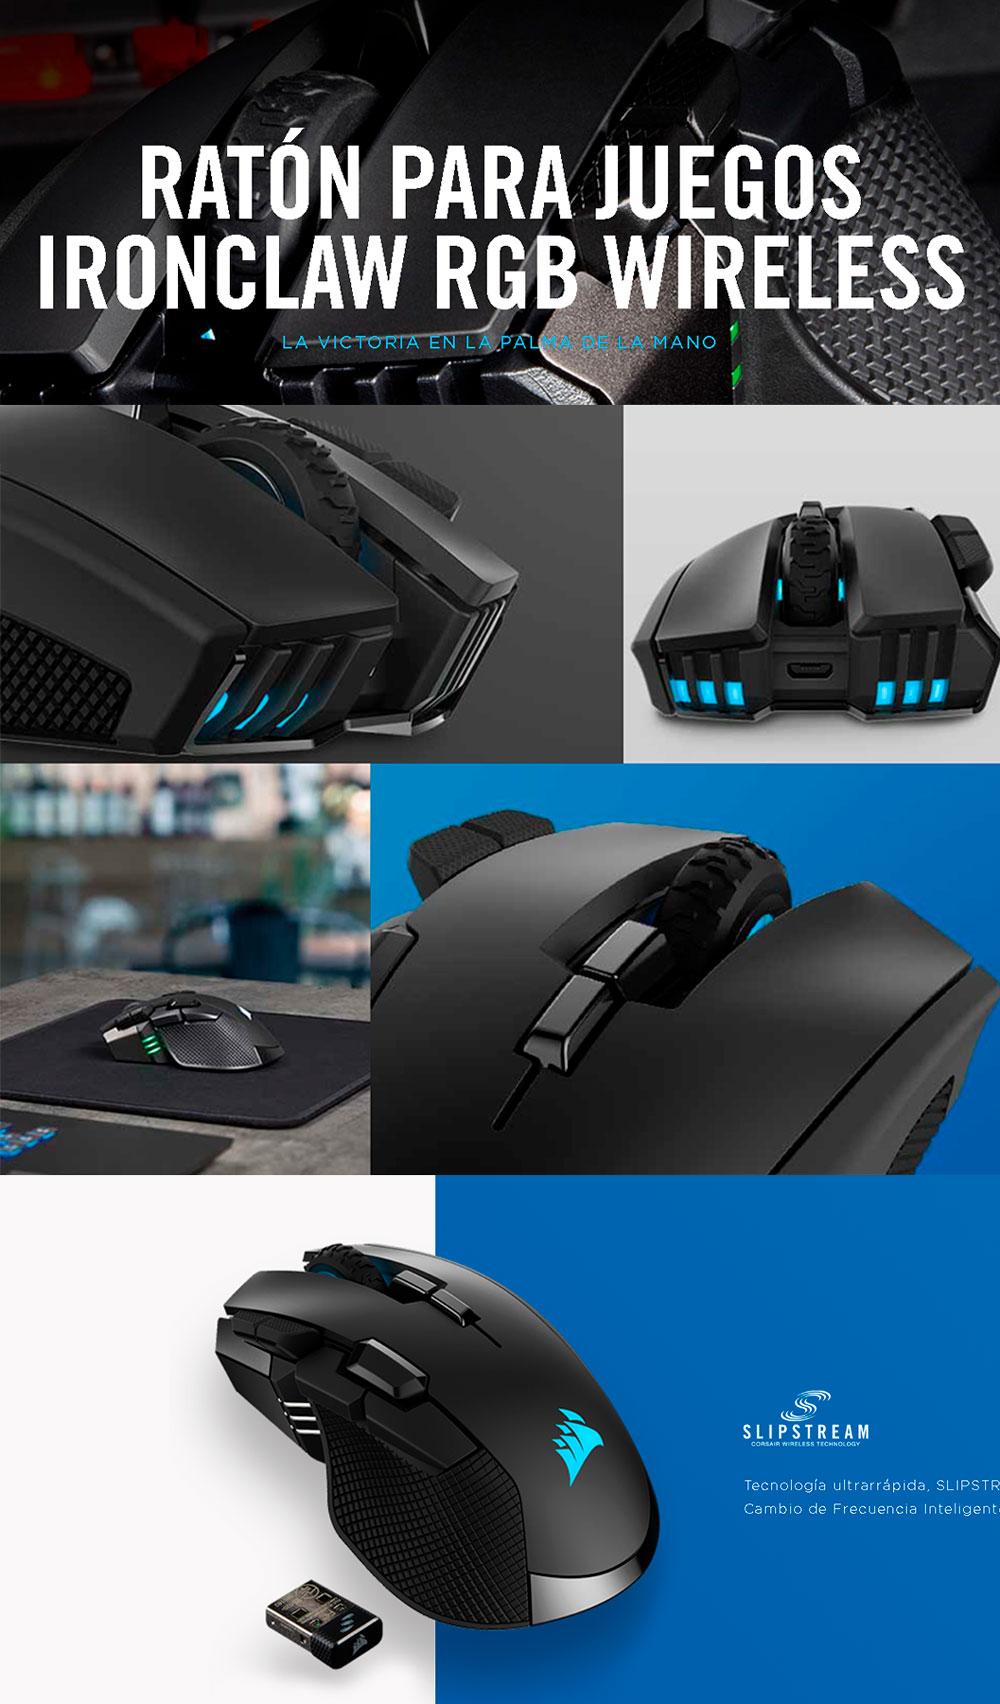 Mouse Gamer Corsair Ironclaw RGB Wireless, Slipstream Wireless Technology, 18000DPI, 10 Botones